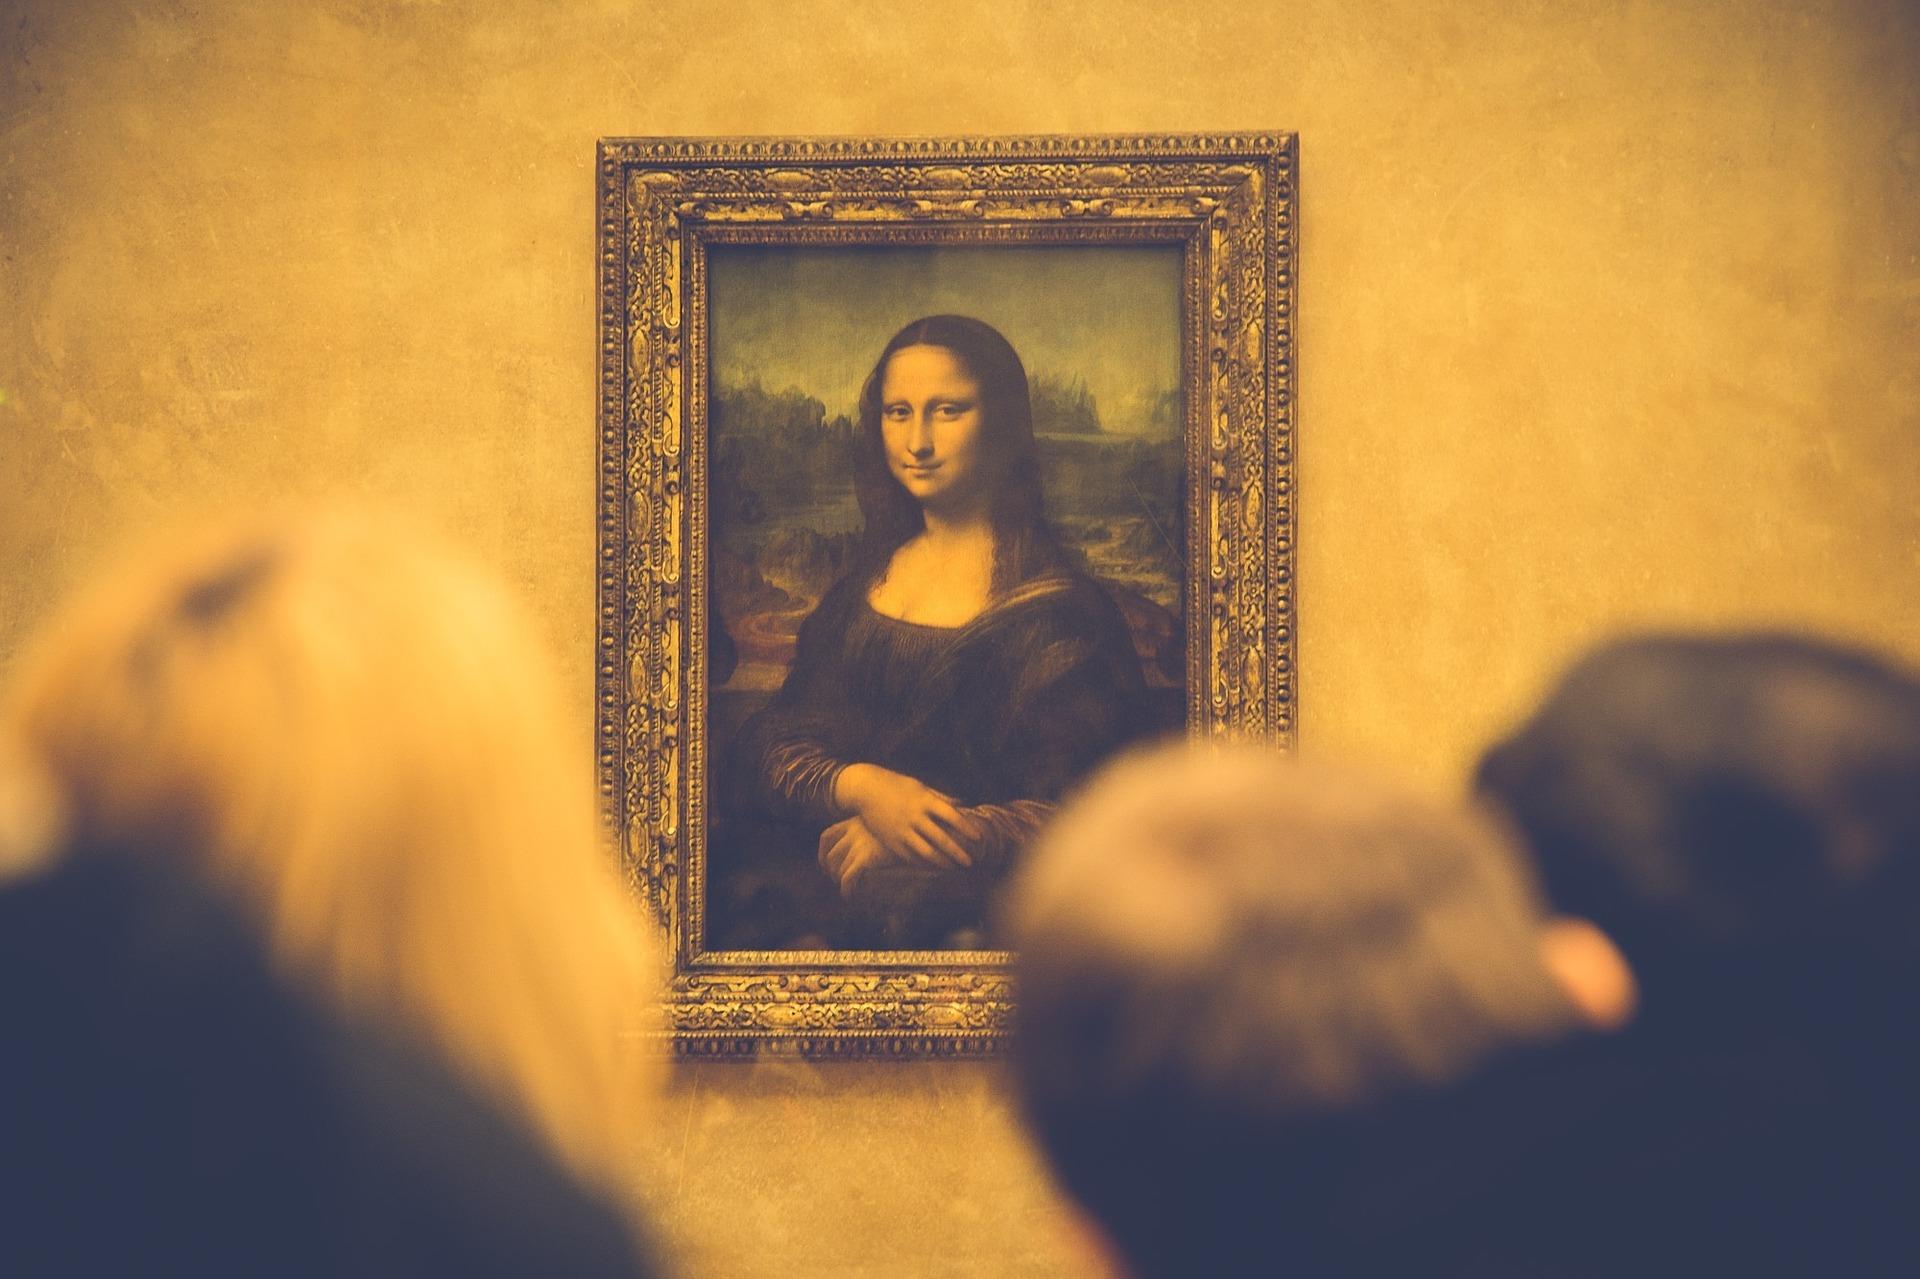 The Mona Lisa from Leonardo da Vinci